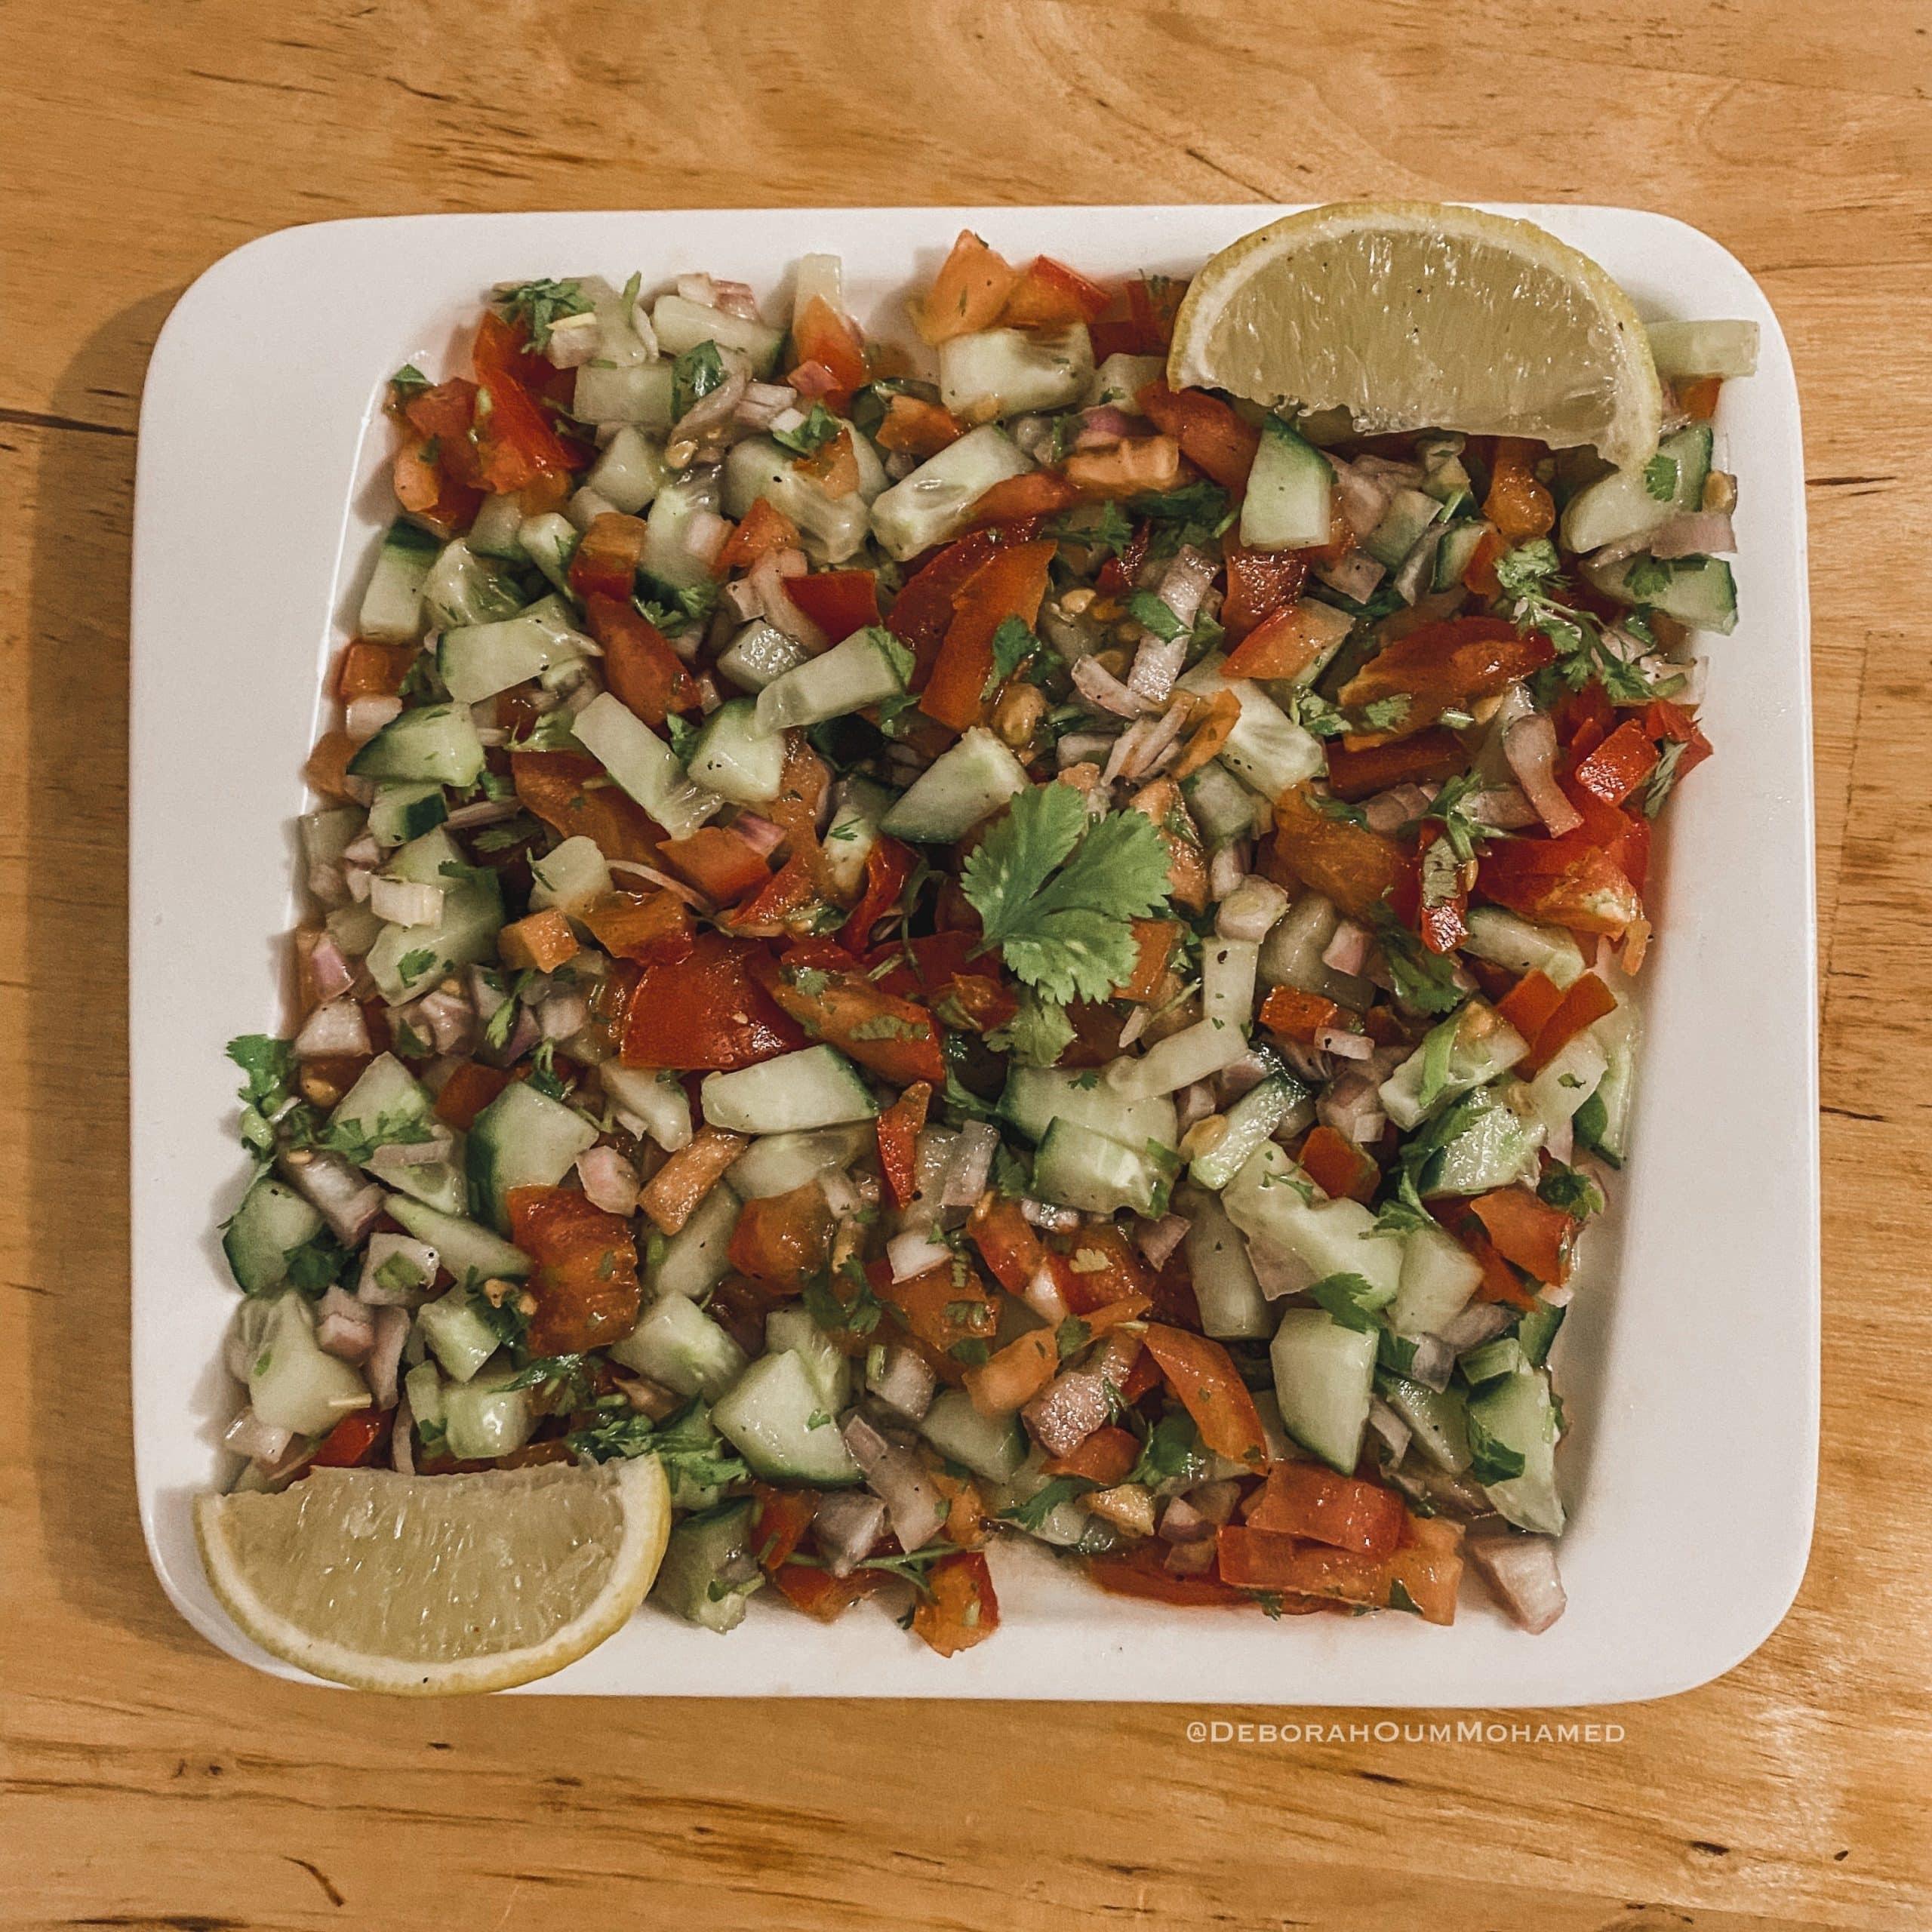 salade-fraicheur-egyptienne